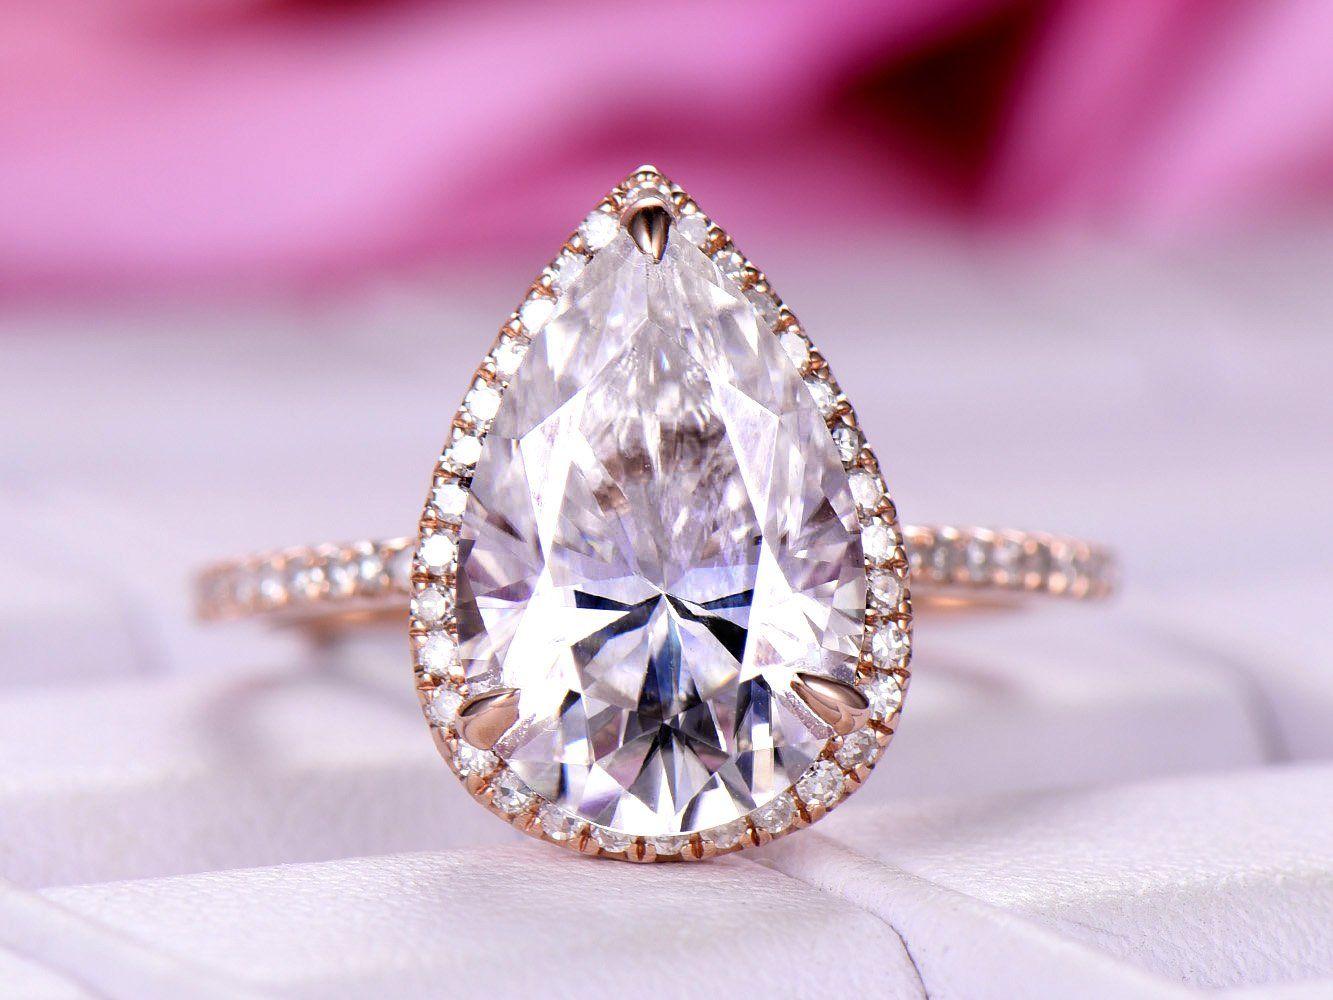 Pear Moissanite Engagement Ring Pave Diamond Wedding 14K Rose Gold 8x12mm - 6 / 14K White Gold